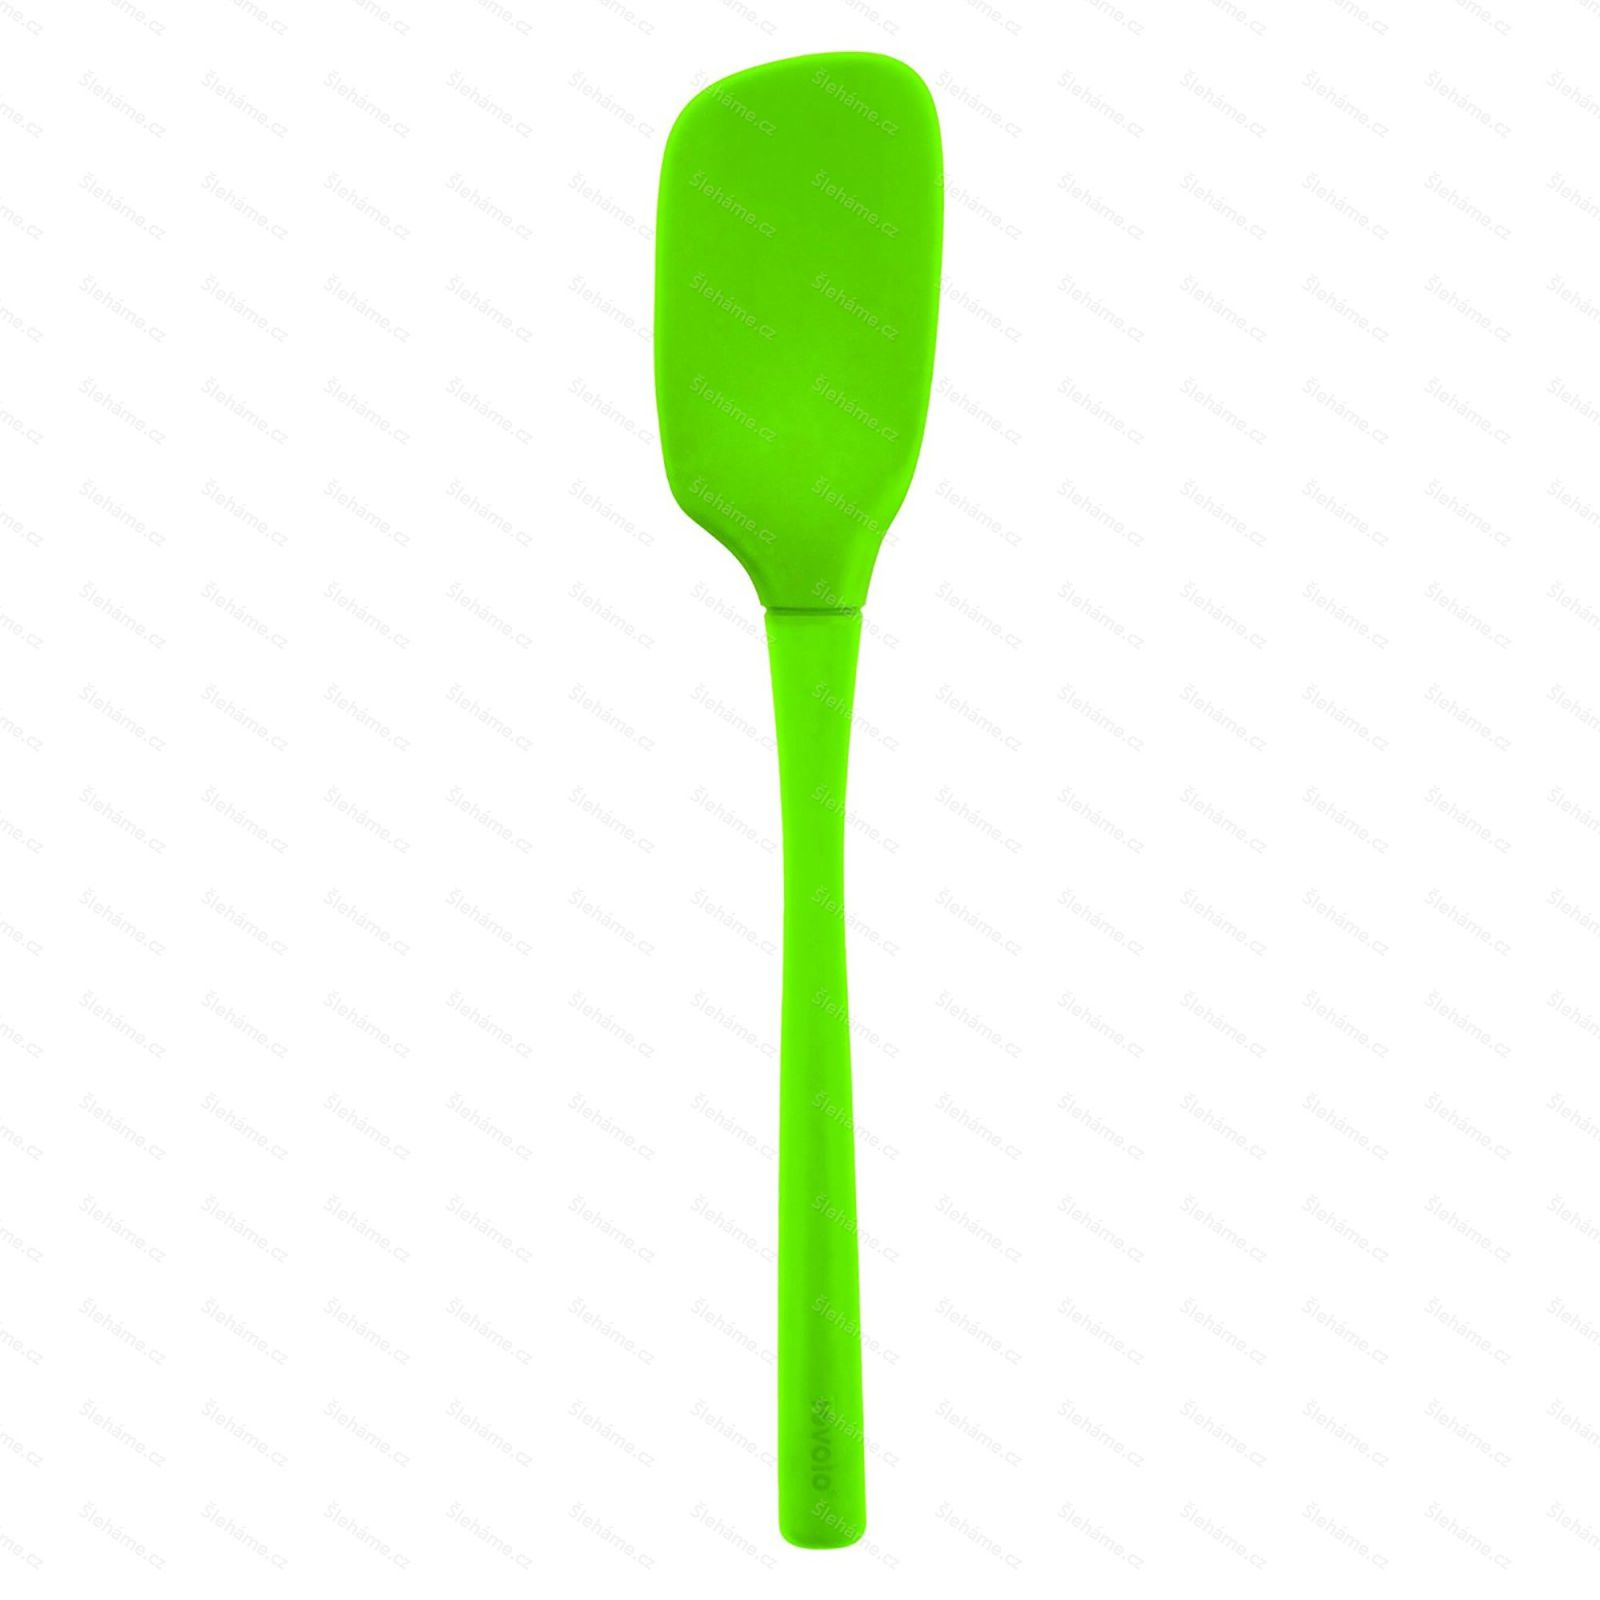 Stěrka Tovolo FLEX-CORE Spoonula, zelená